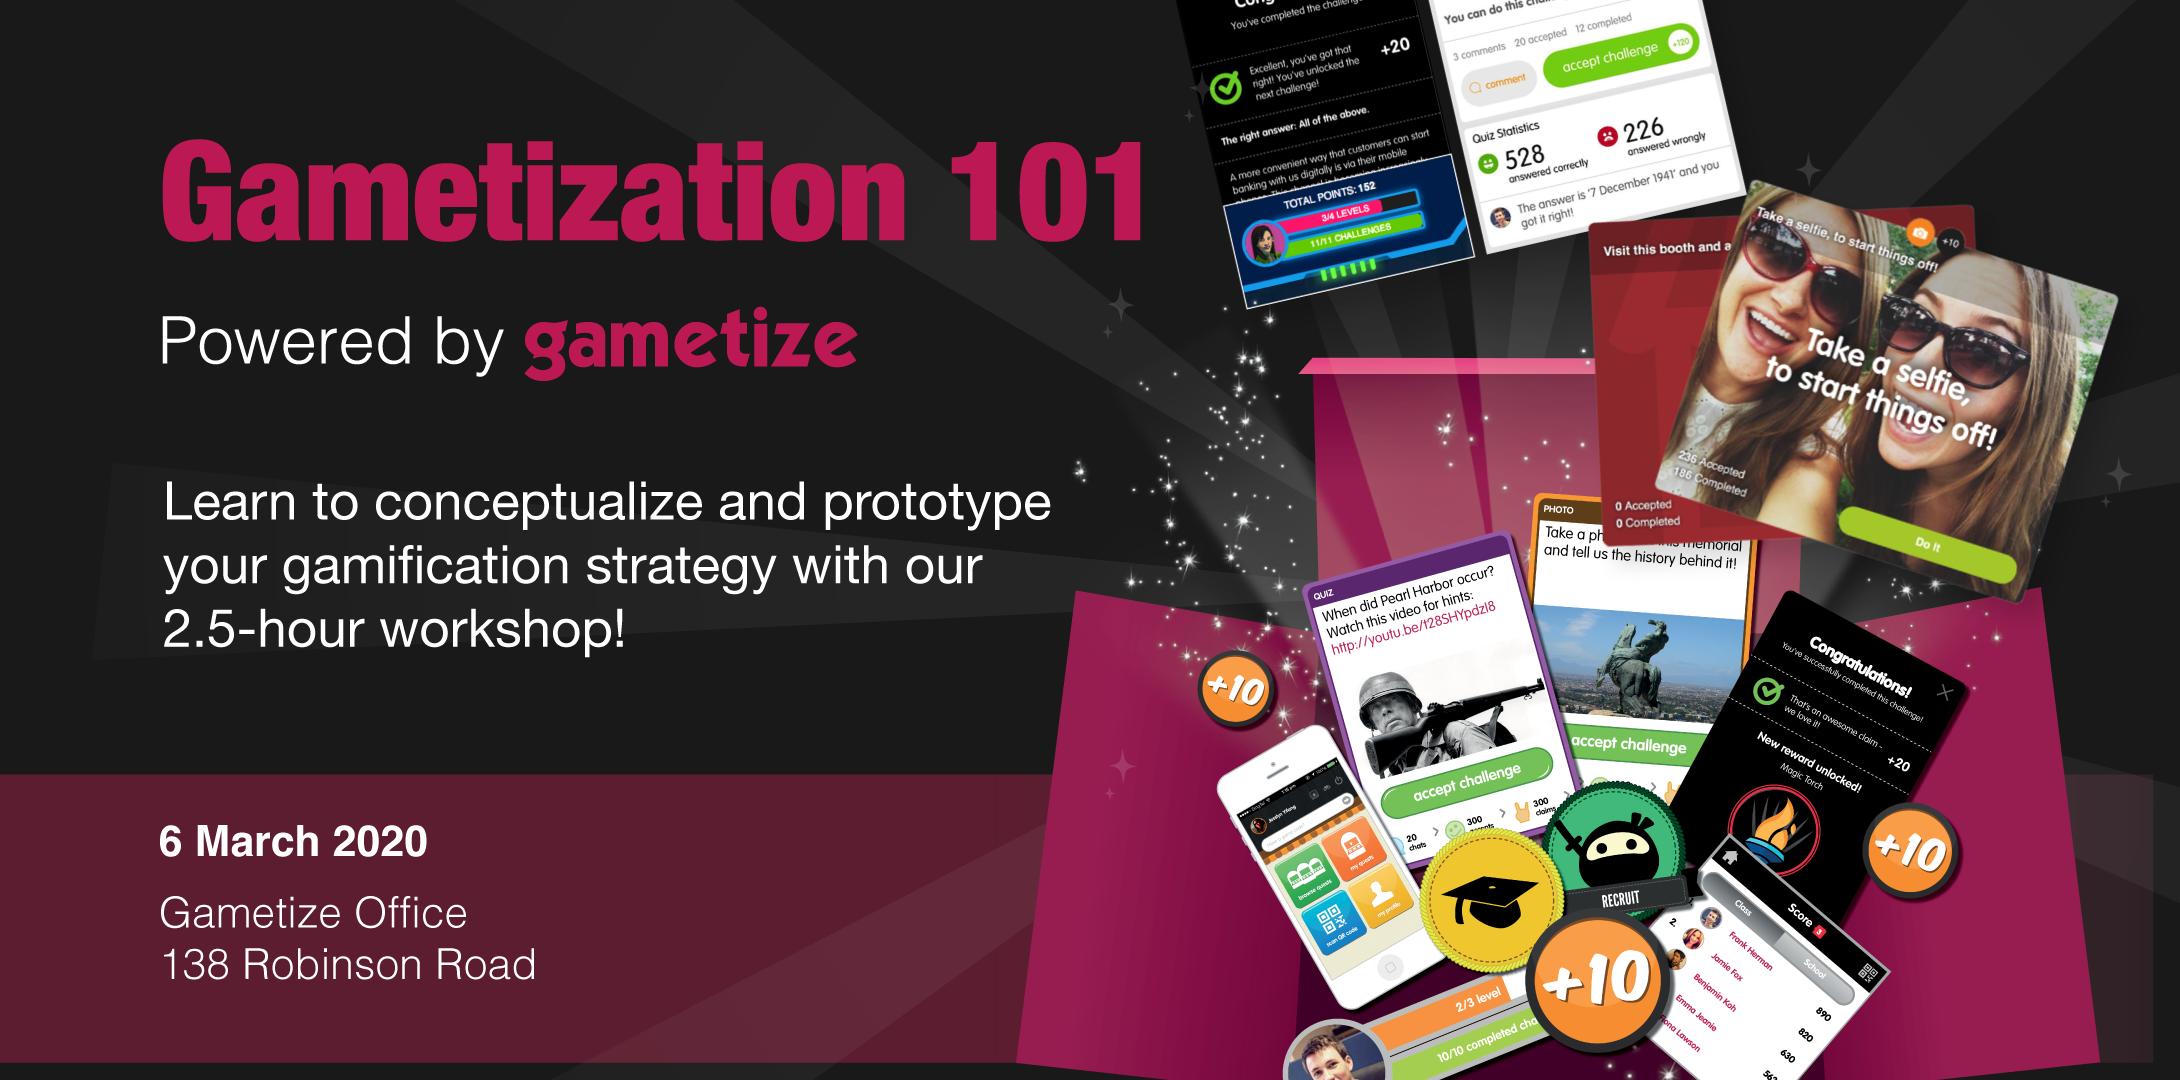 [EVENT] Gametization 101 Workshop (March)